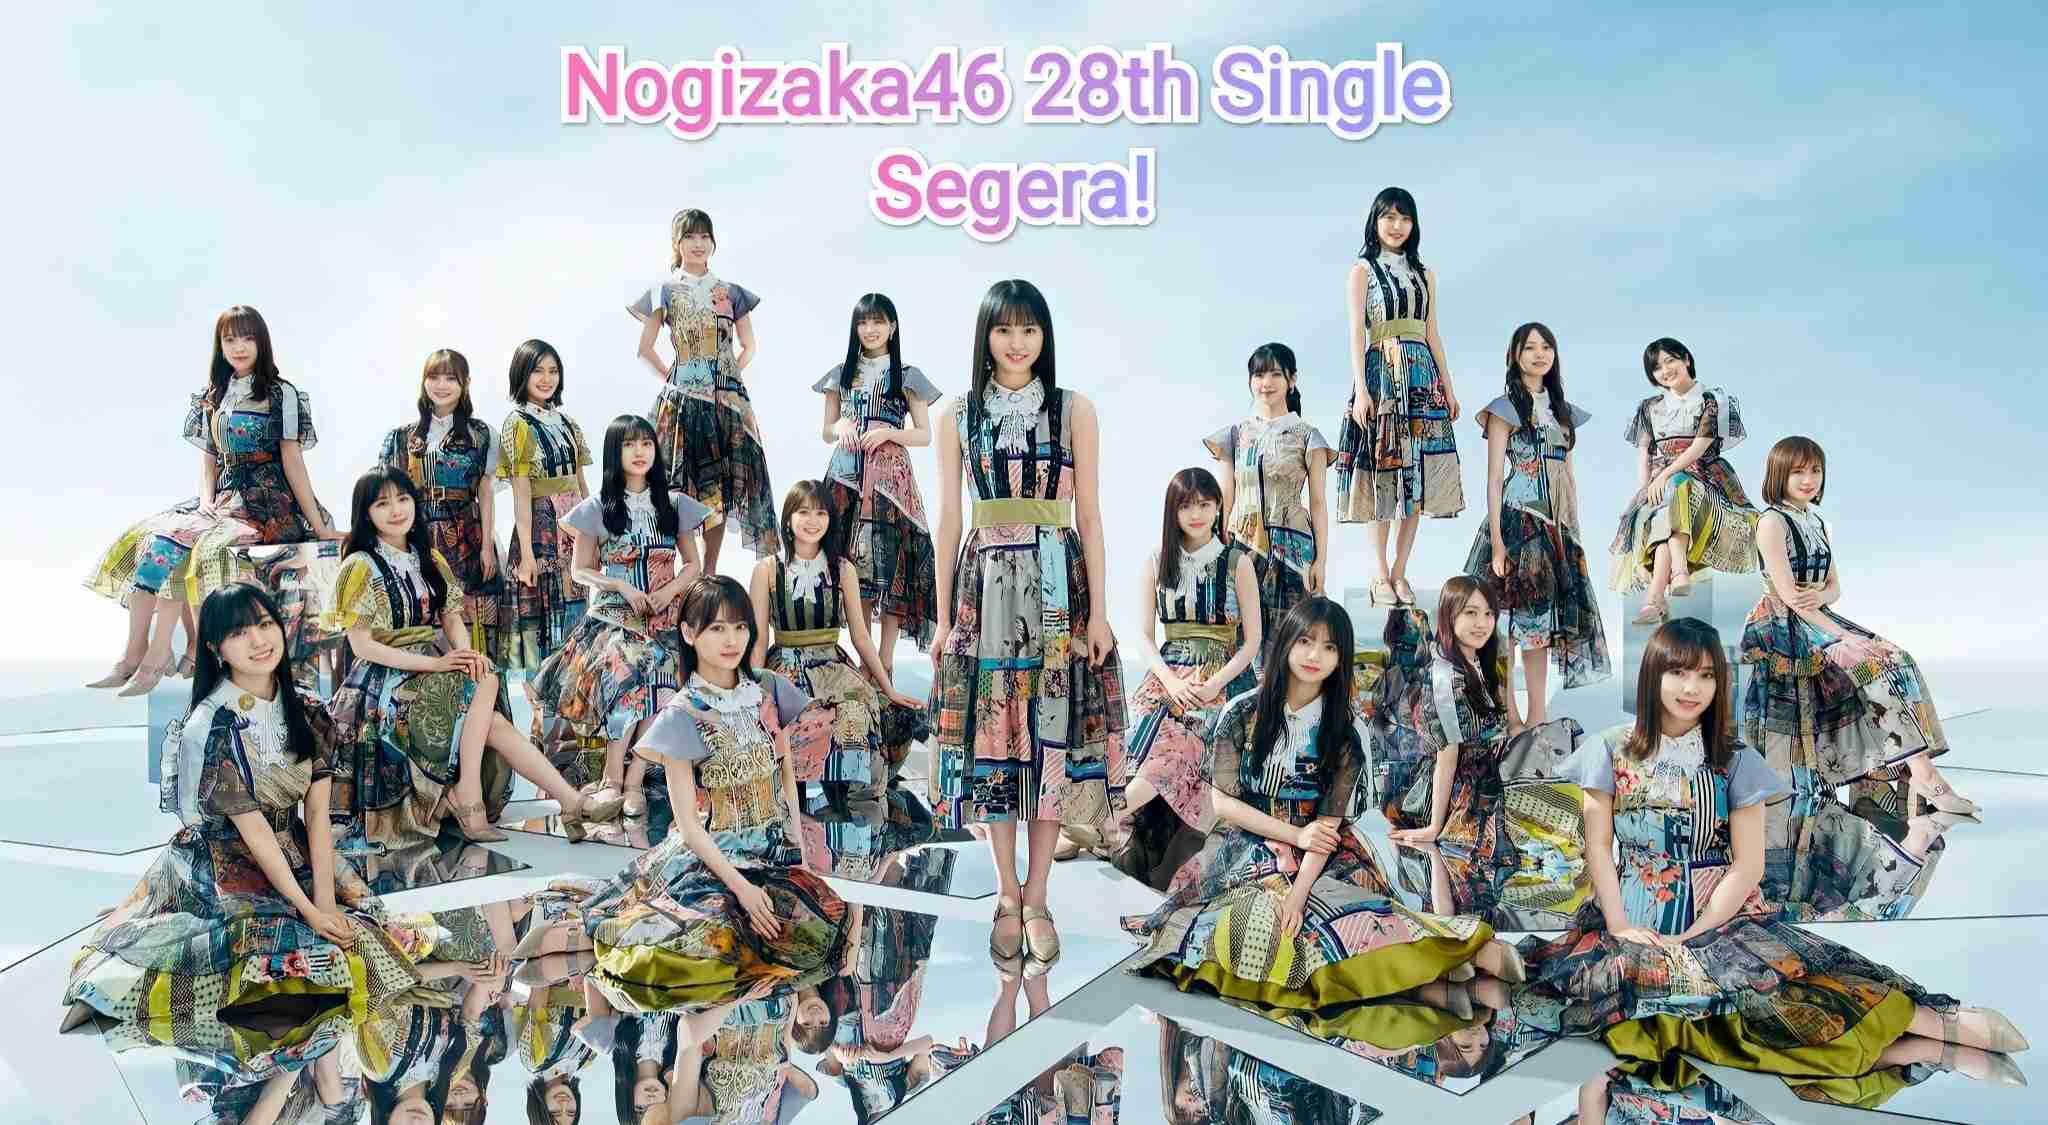 nogizaka46 28th single mv